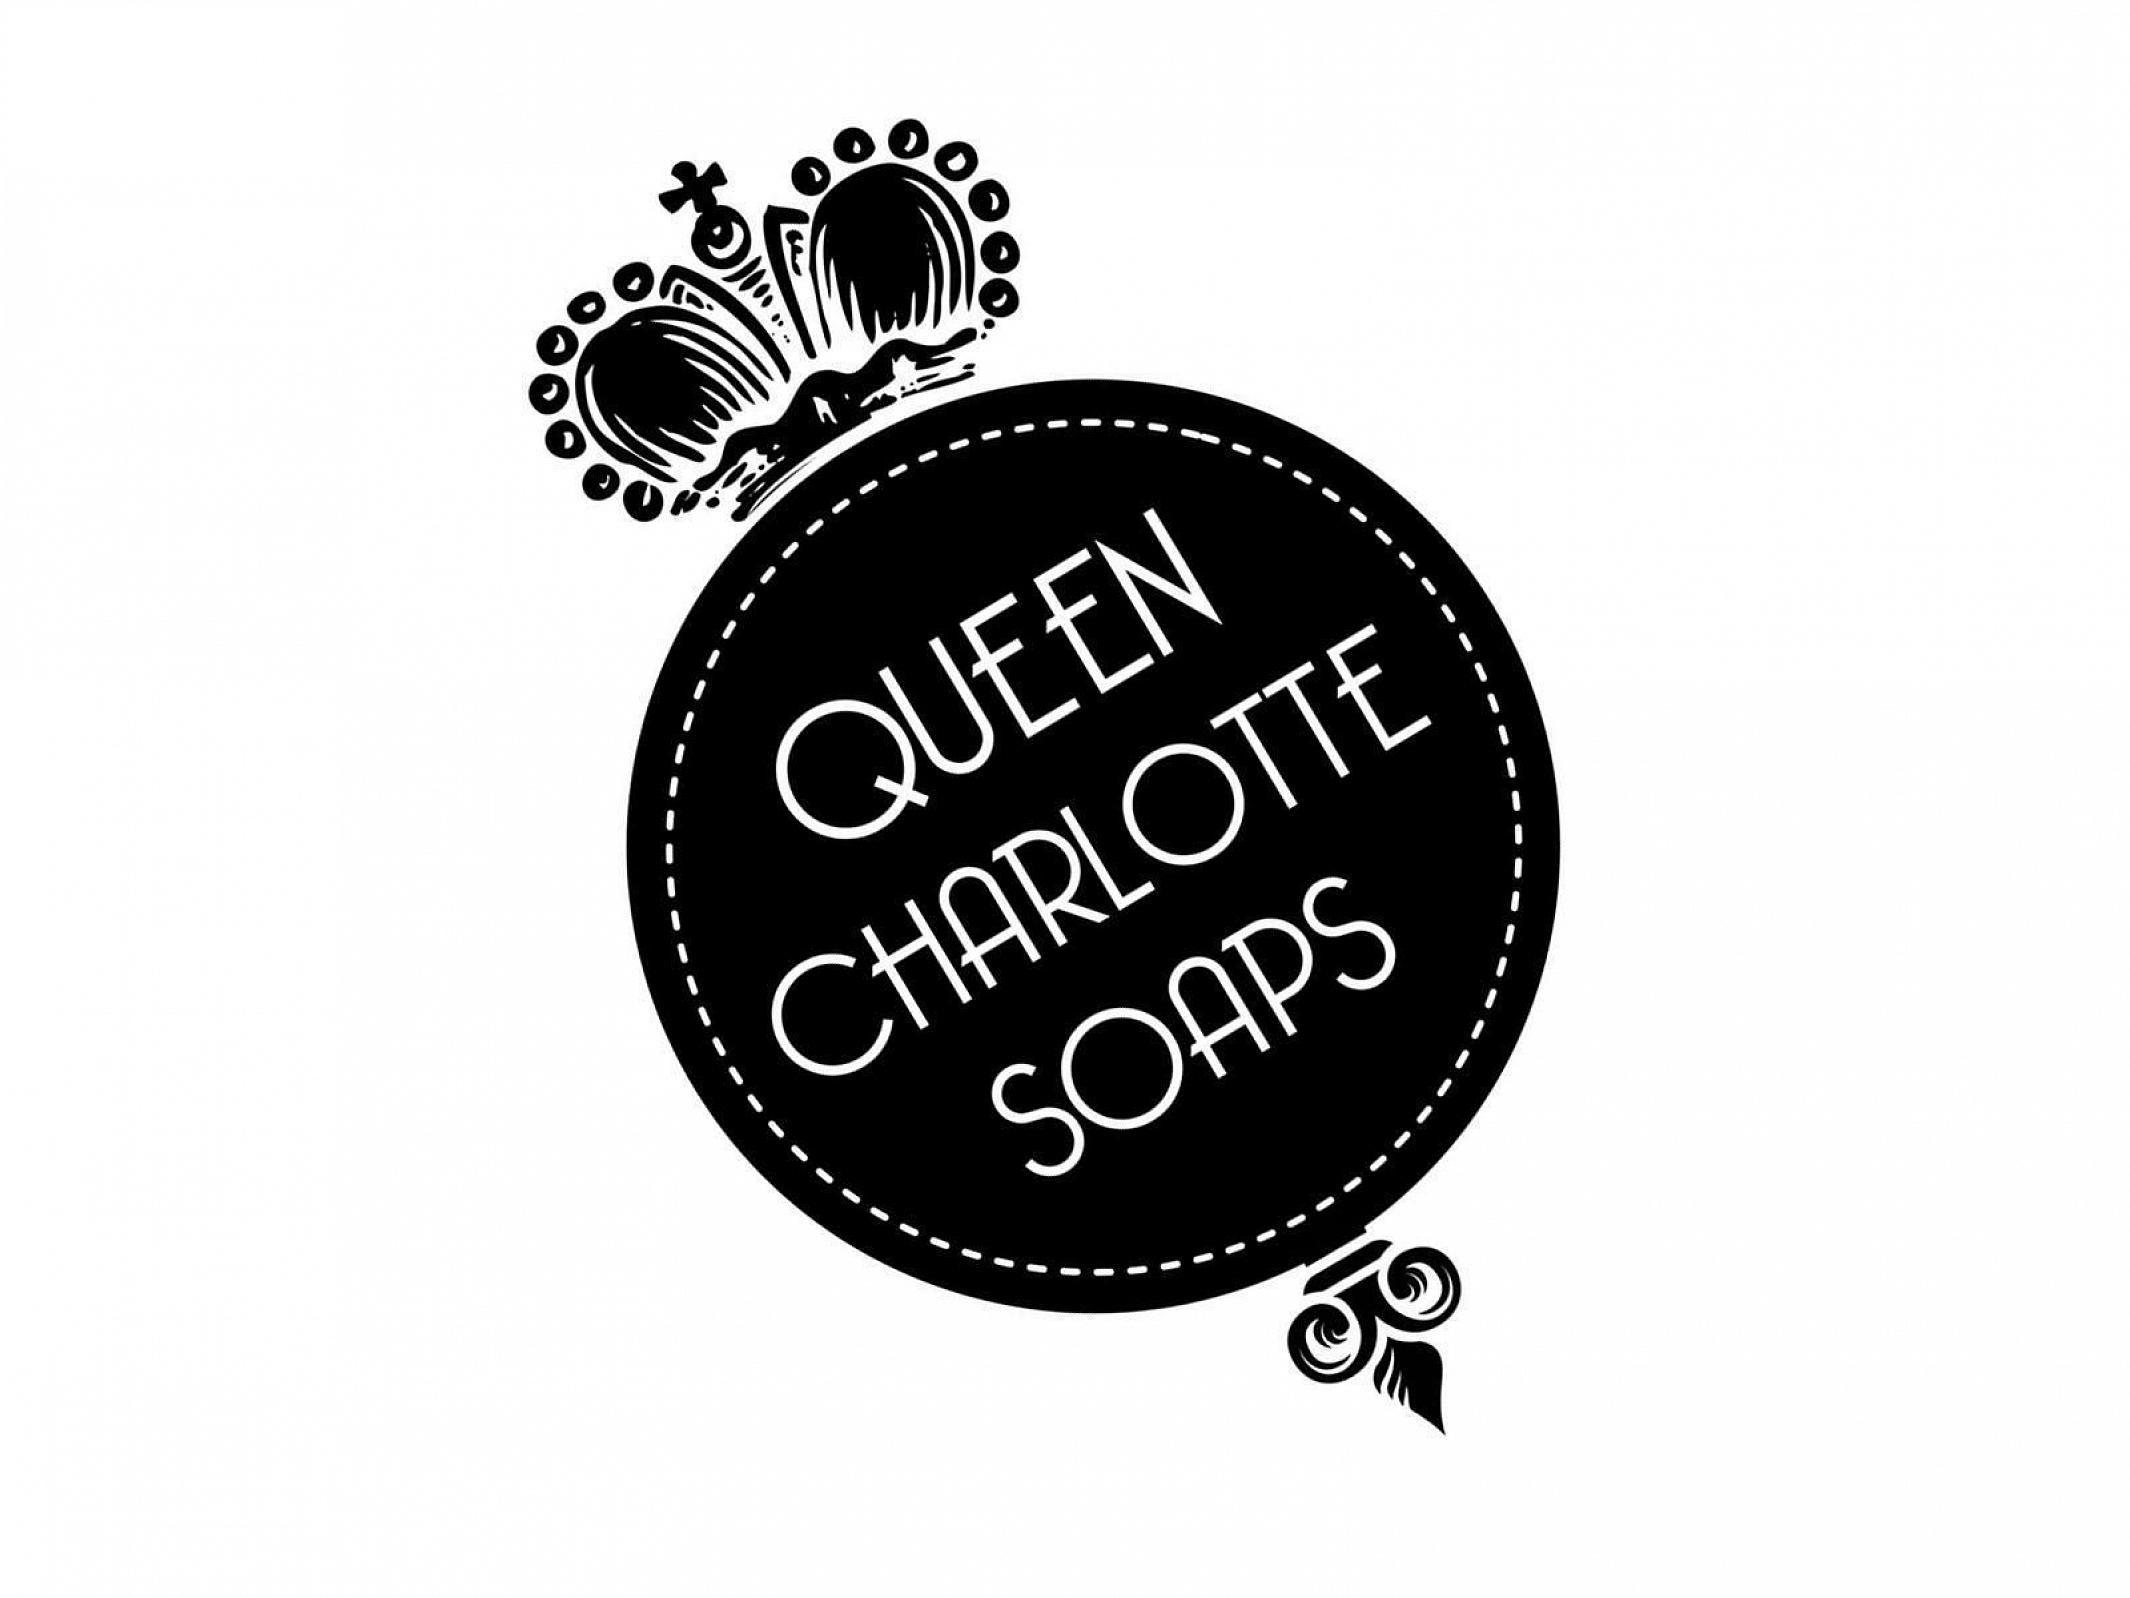 Queen Charlotte Soaps